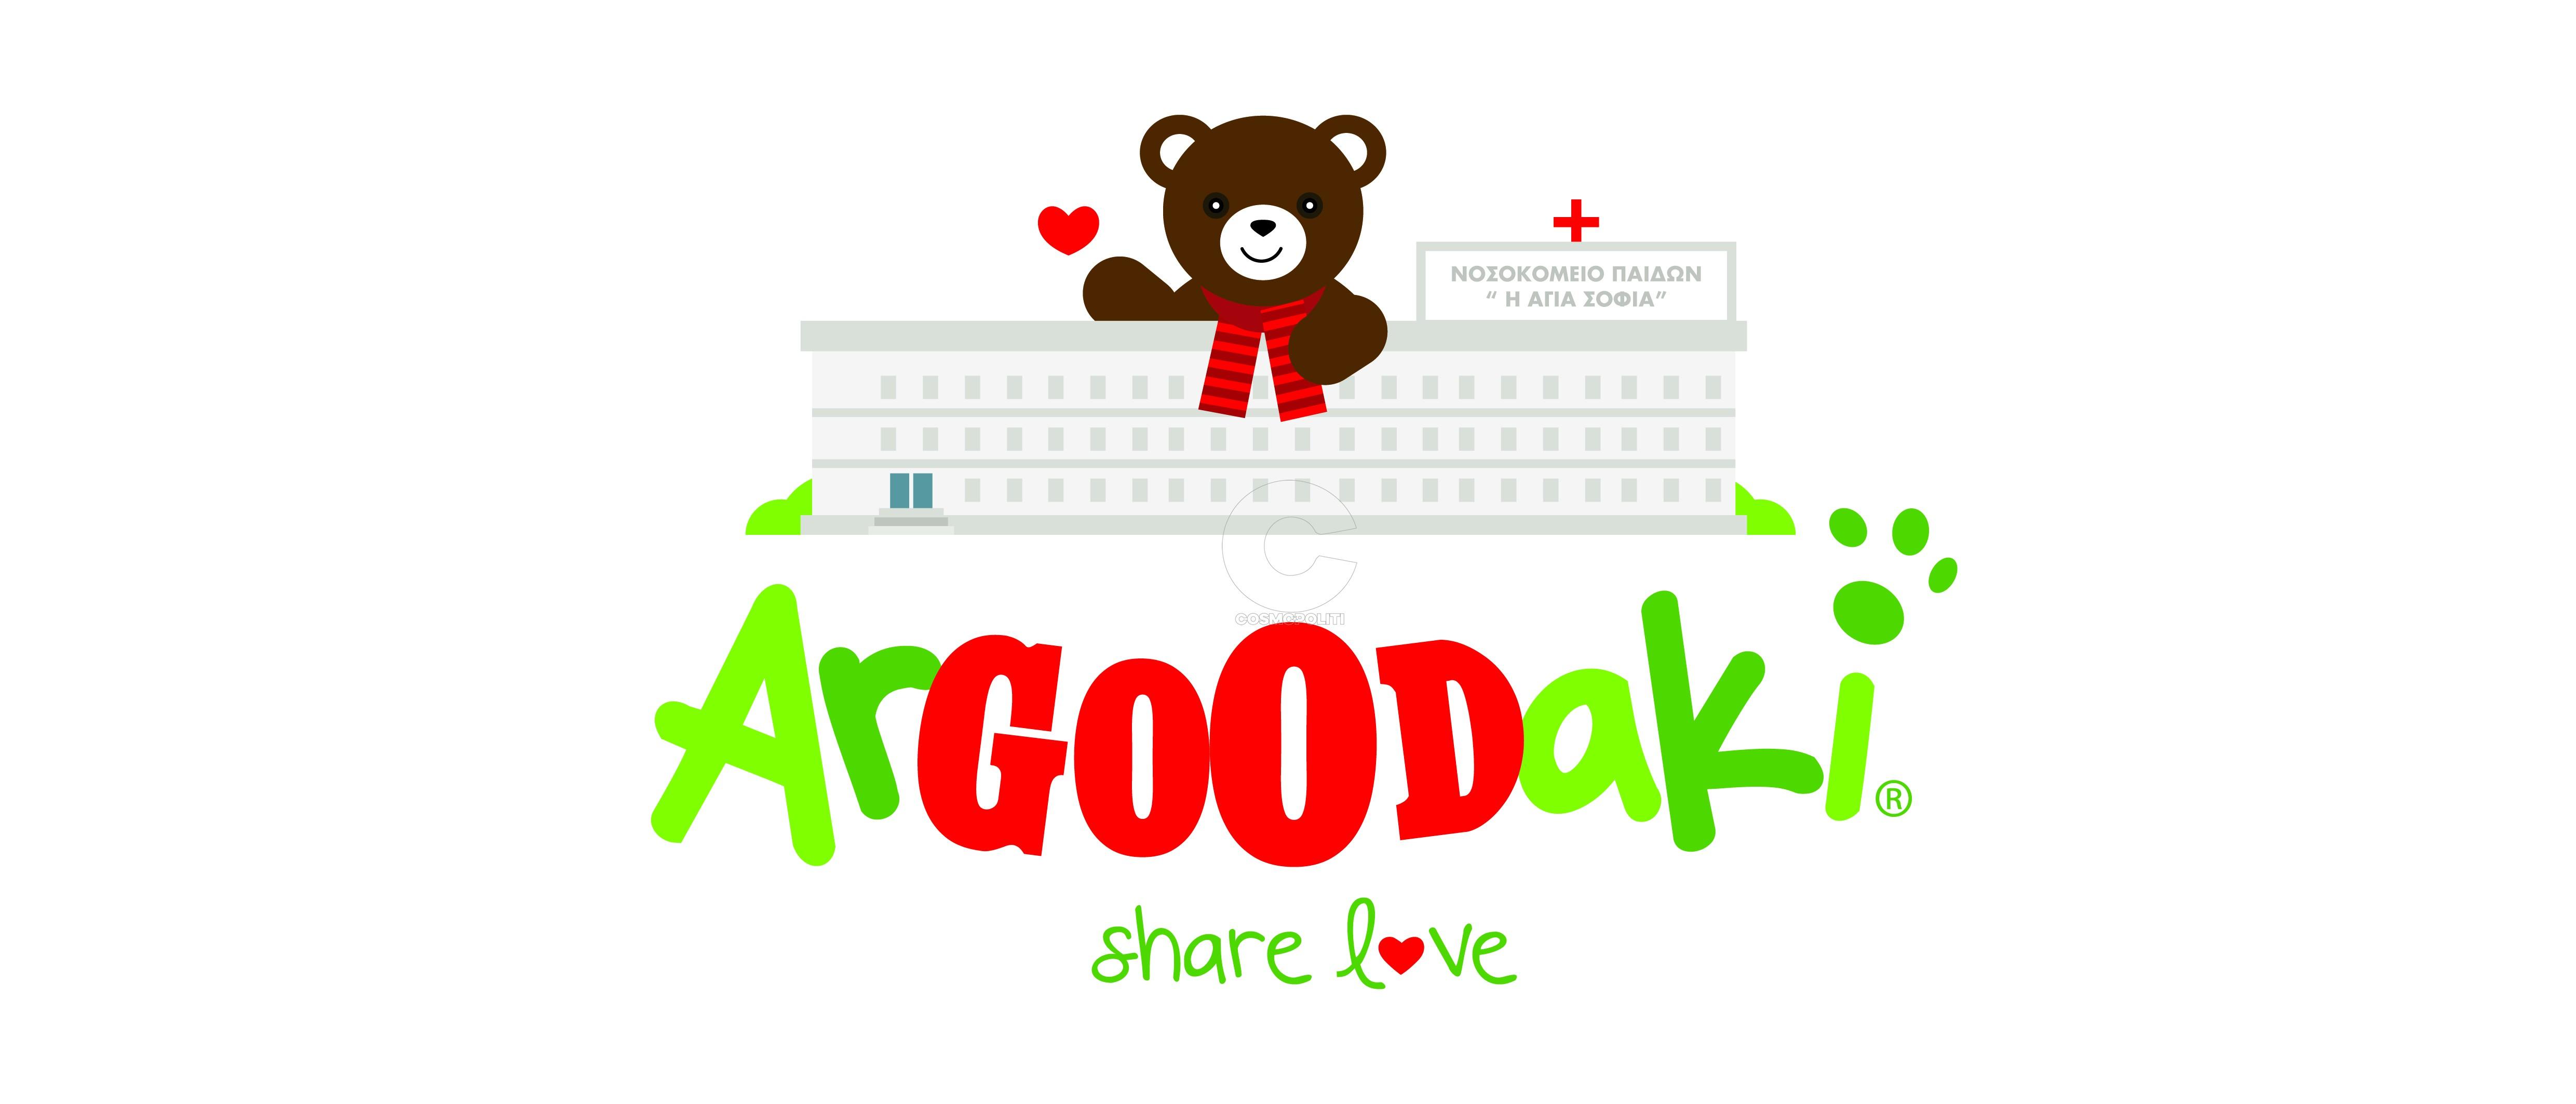 Argoodaki visual